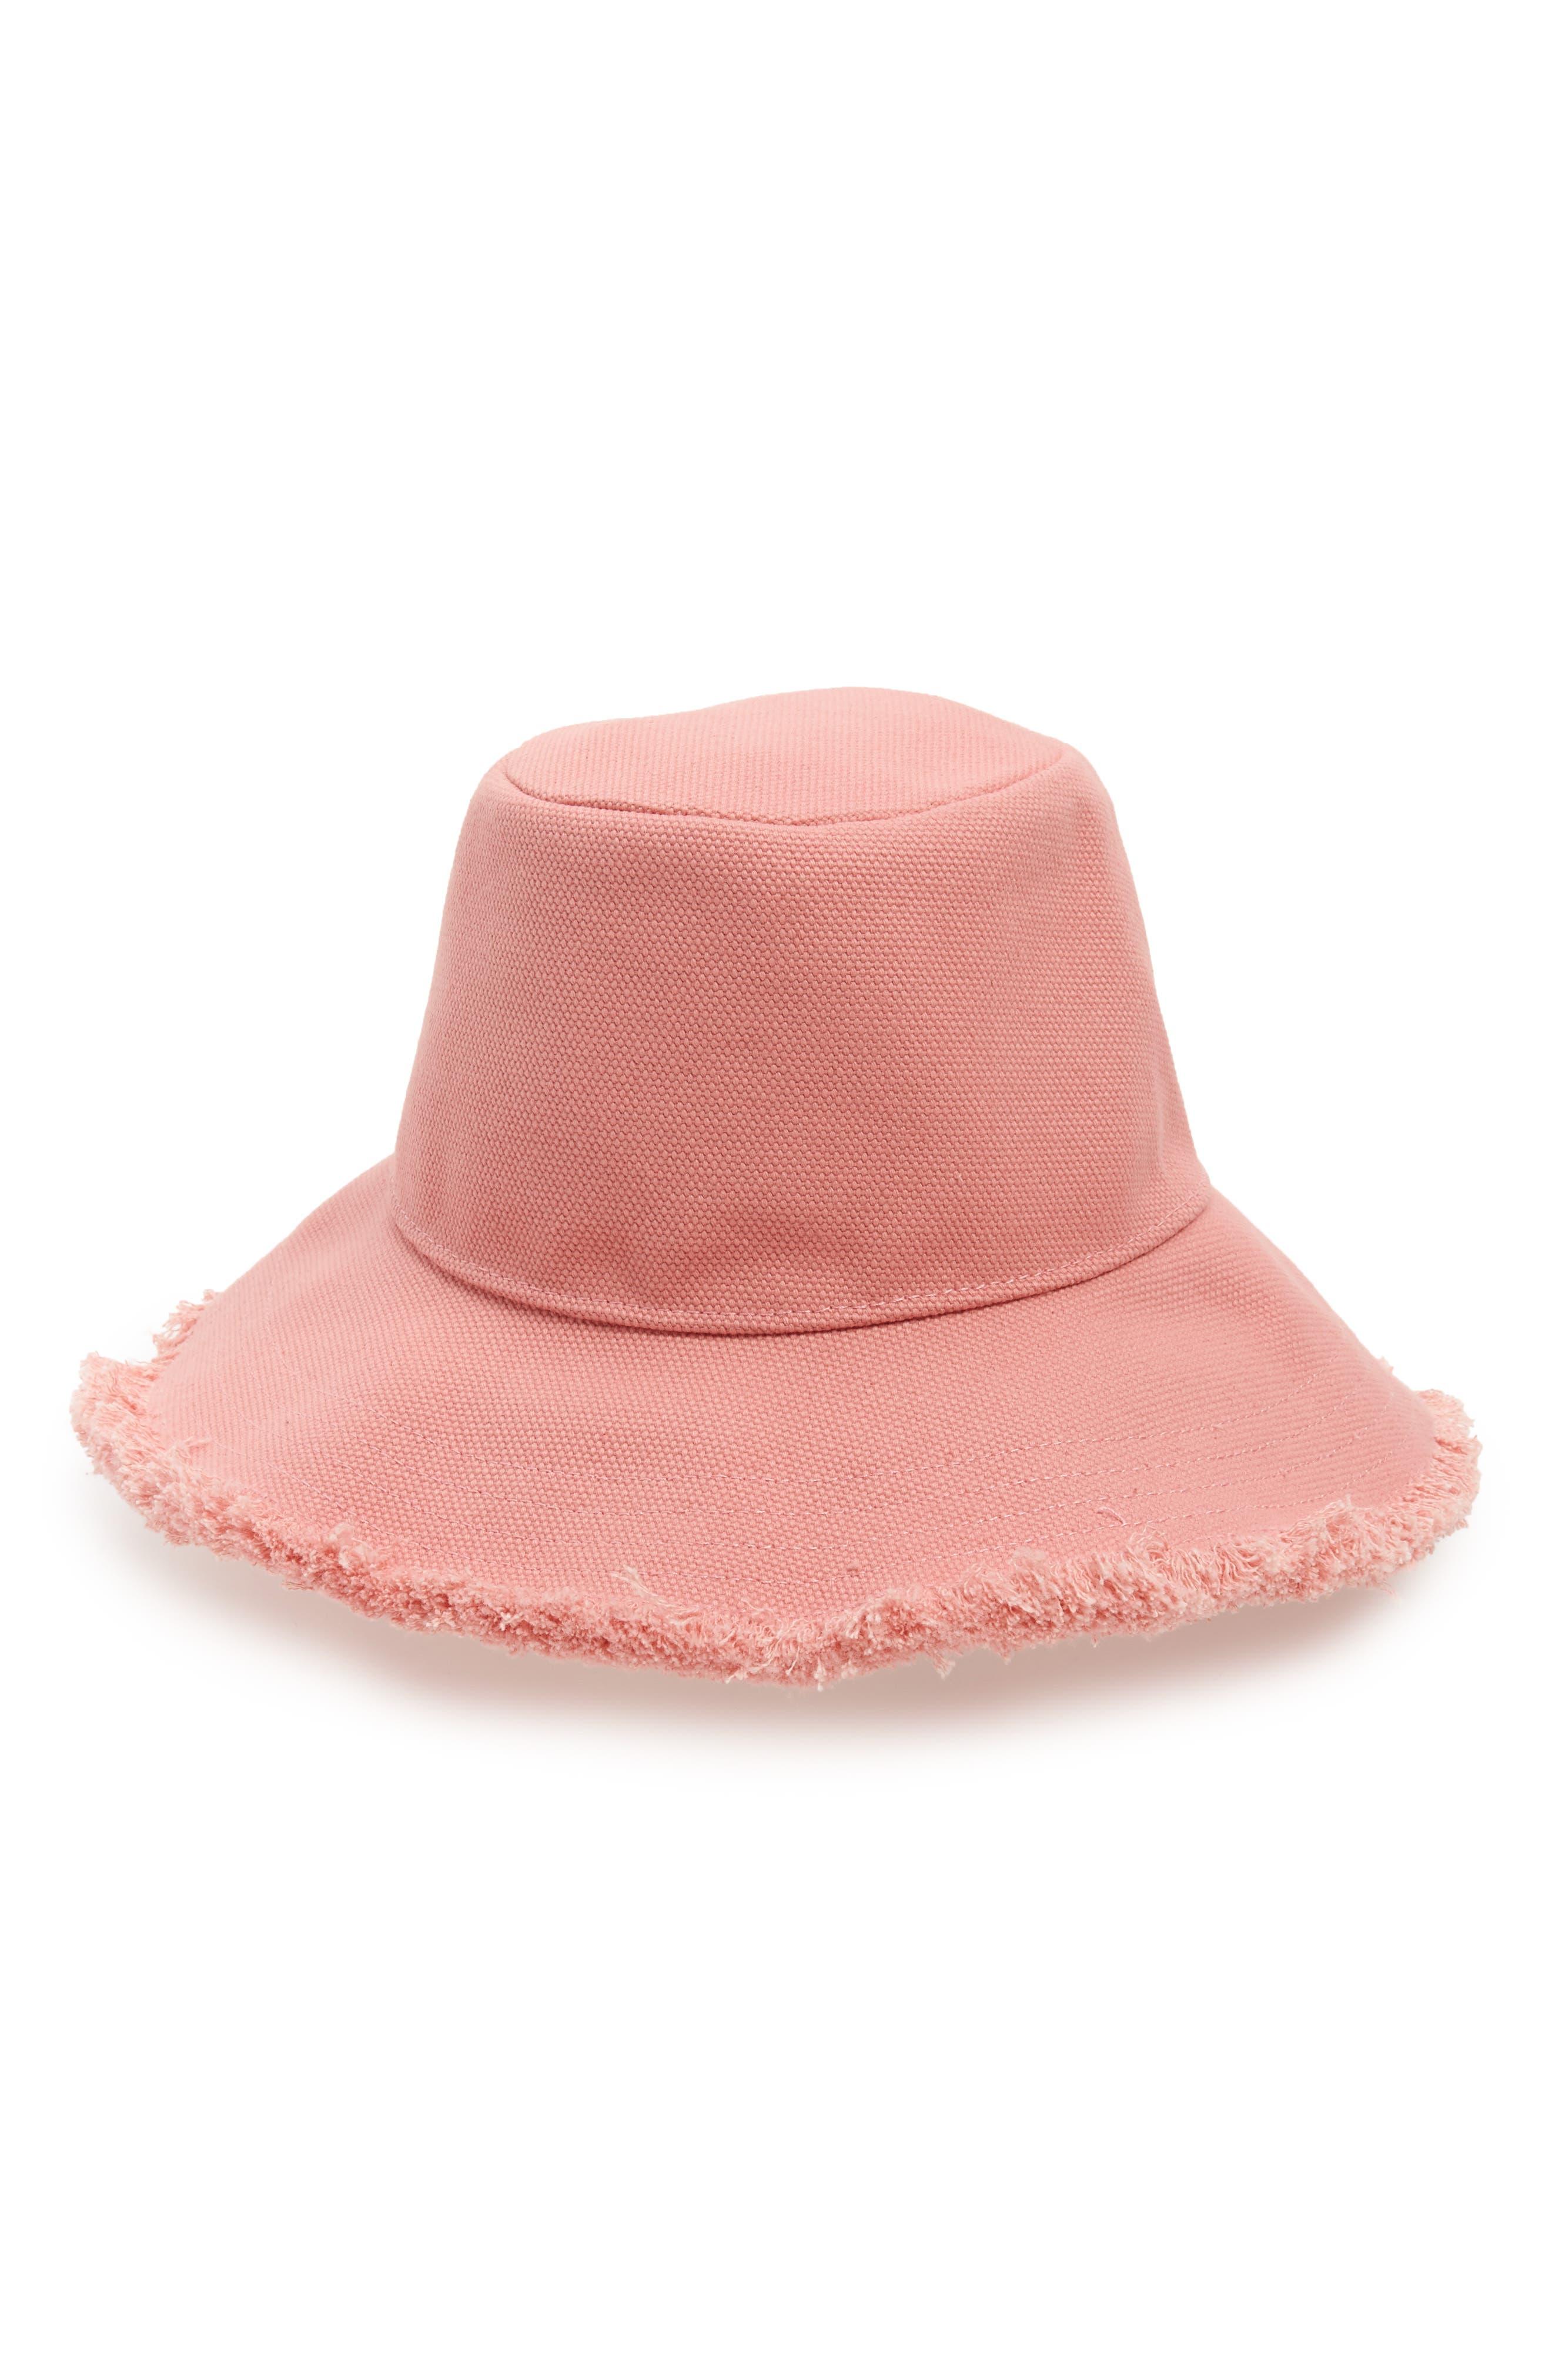 MADEWELL,                             Canvas Bucket Hat,                             Main thumbnail 1, color,                             651